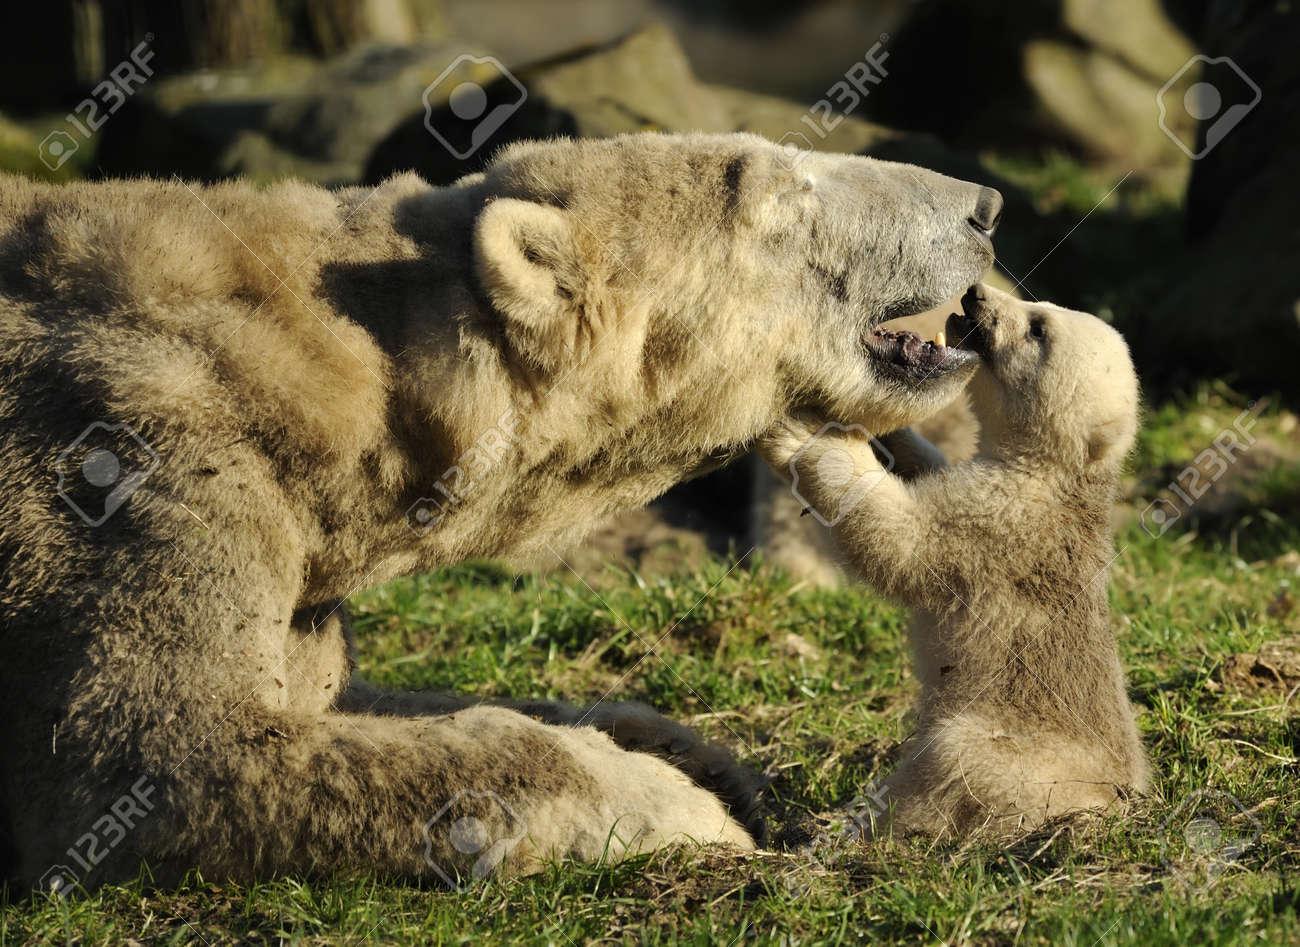 close-up of a polar bear and her cute cub Standard-Bild - 4548955